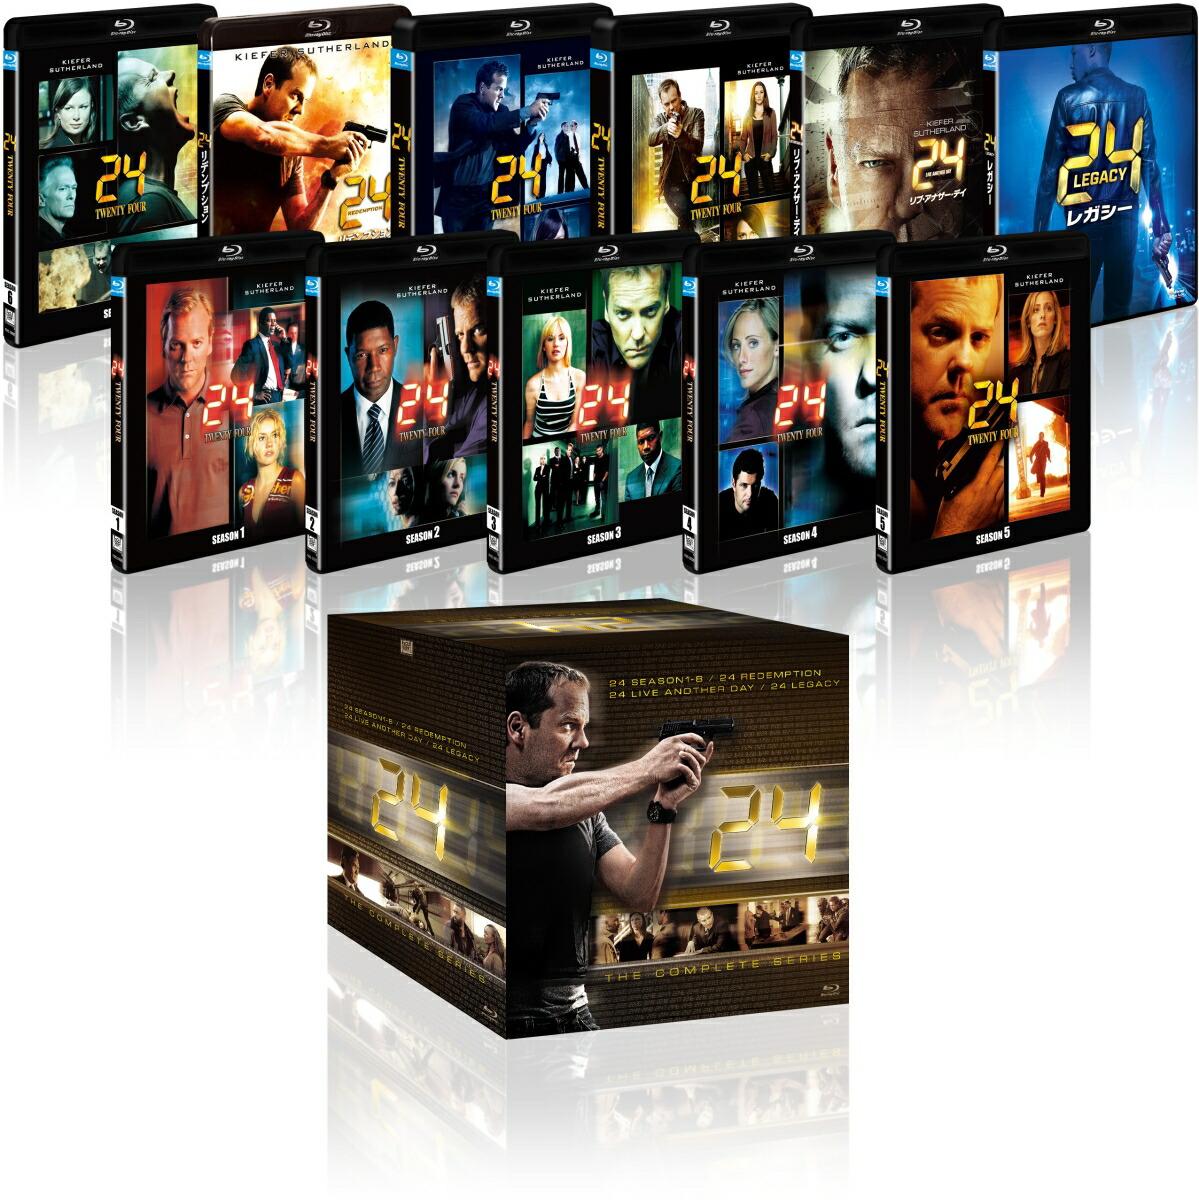 24-TWENTY FOUR- コンプリート ブルーレイBOX(「24-TWENTY FOUR- レガシー」付)[FXXSA-85705][Blu-ray/ブルーレイ]